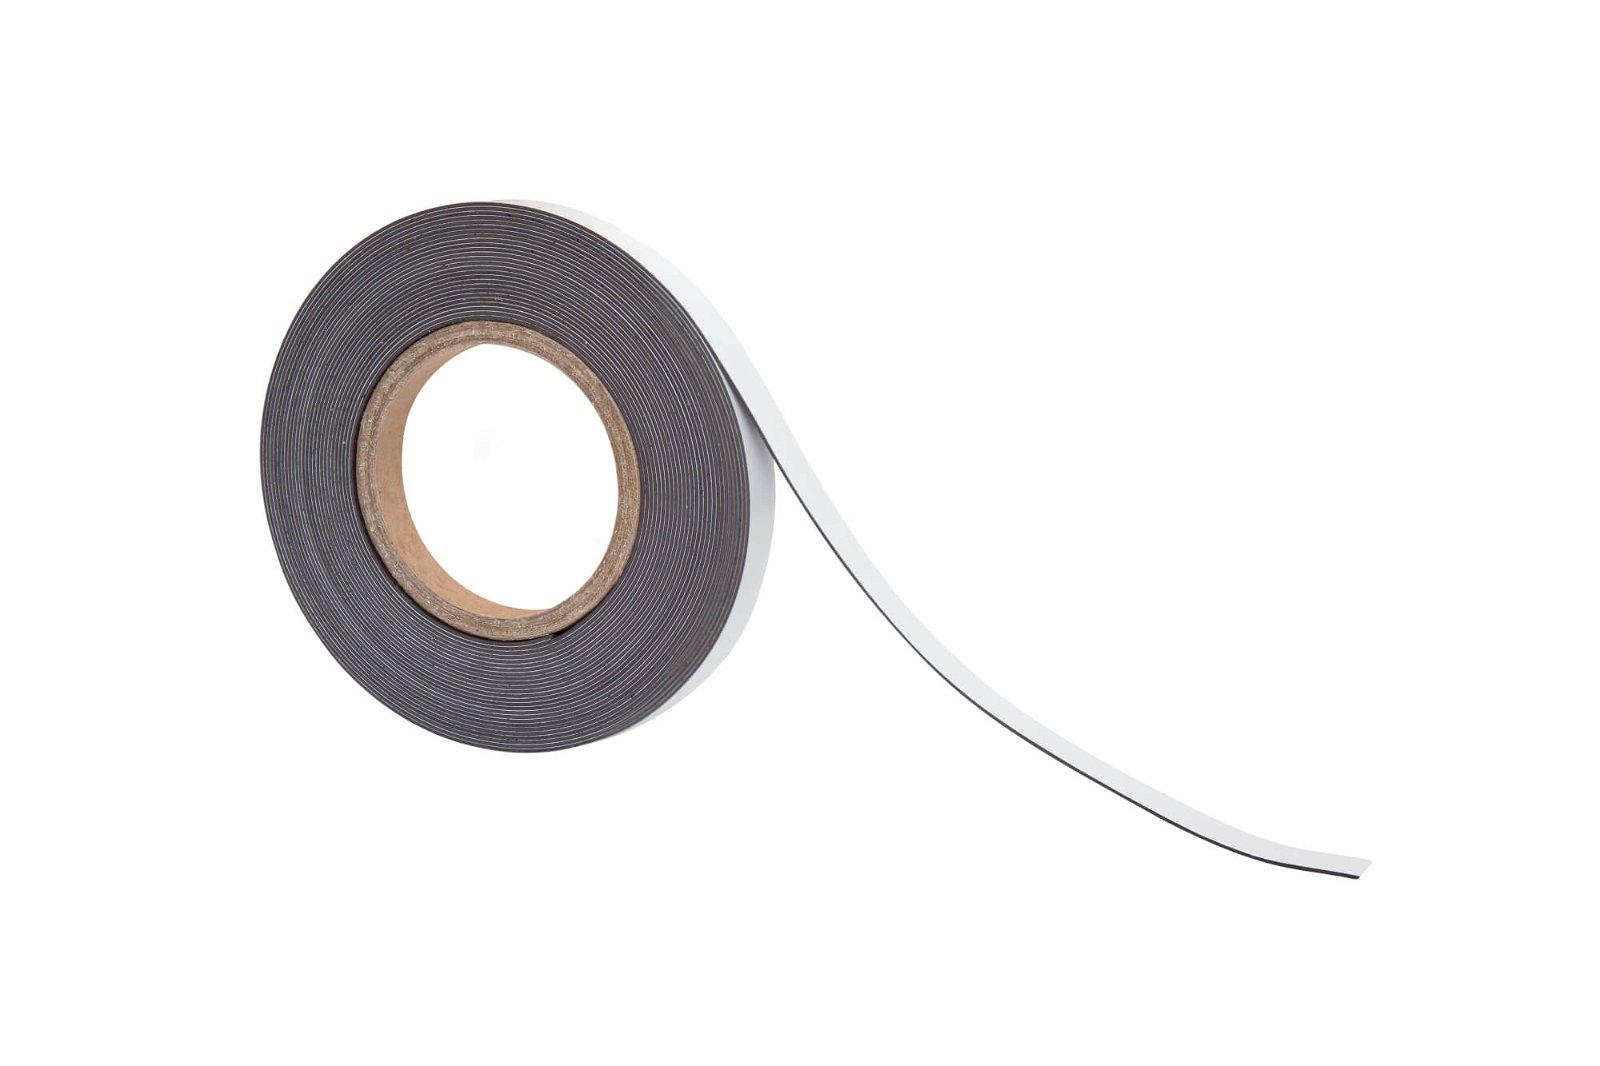 Magnetband selbstklebend, 10 m x 25 mm x 1 mm, sonstige